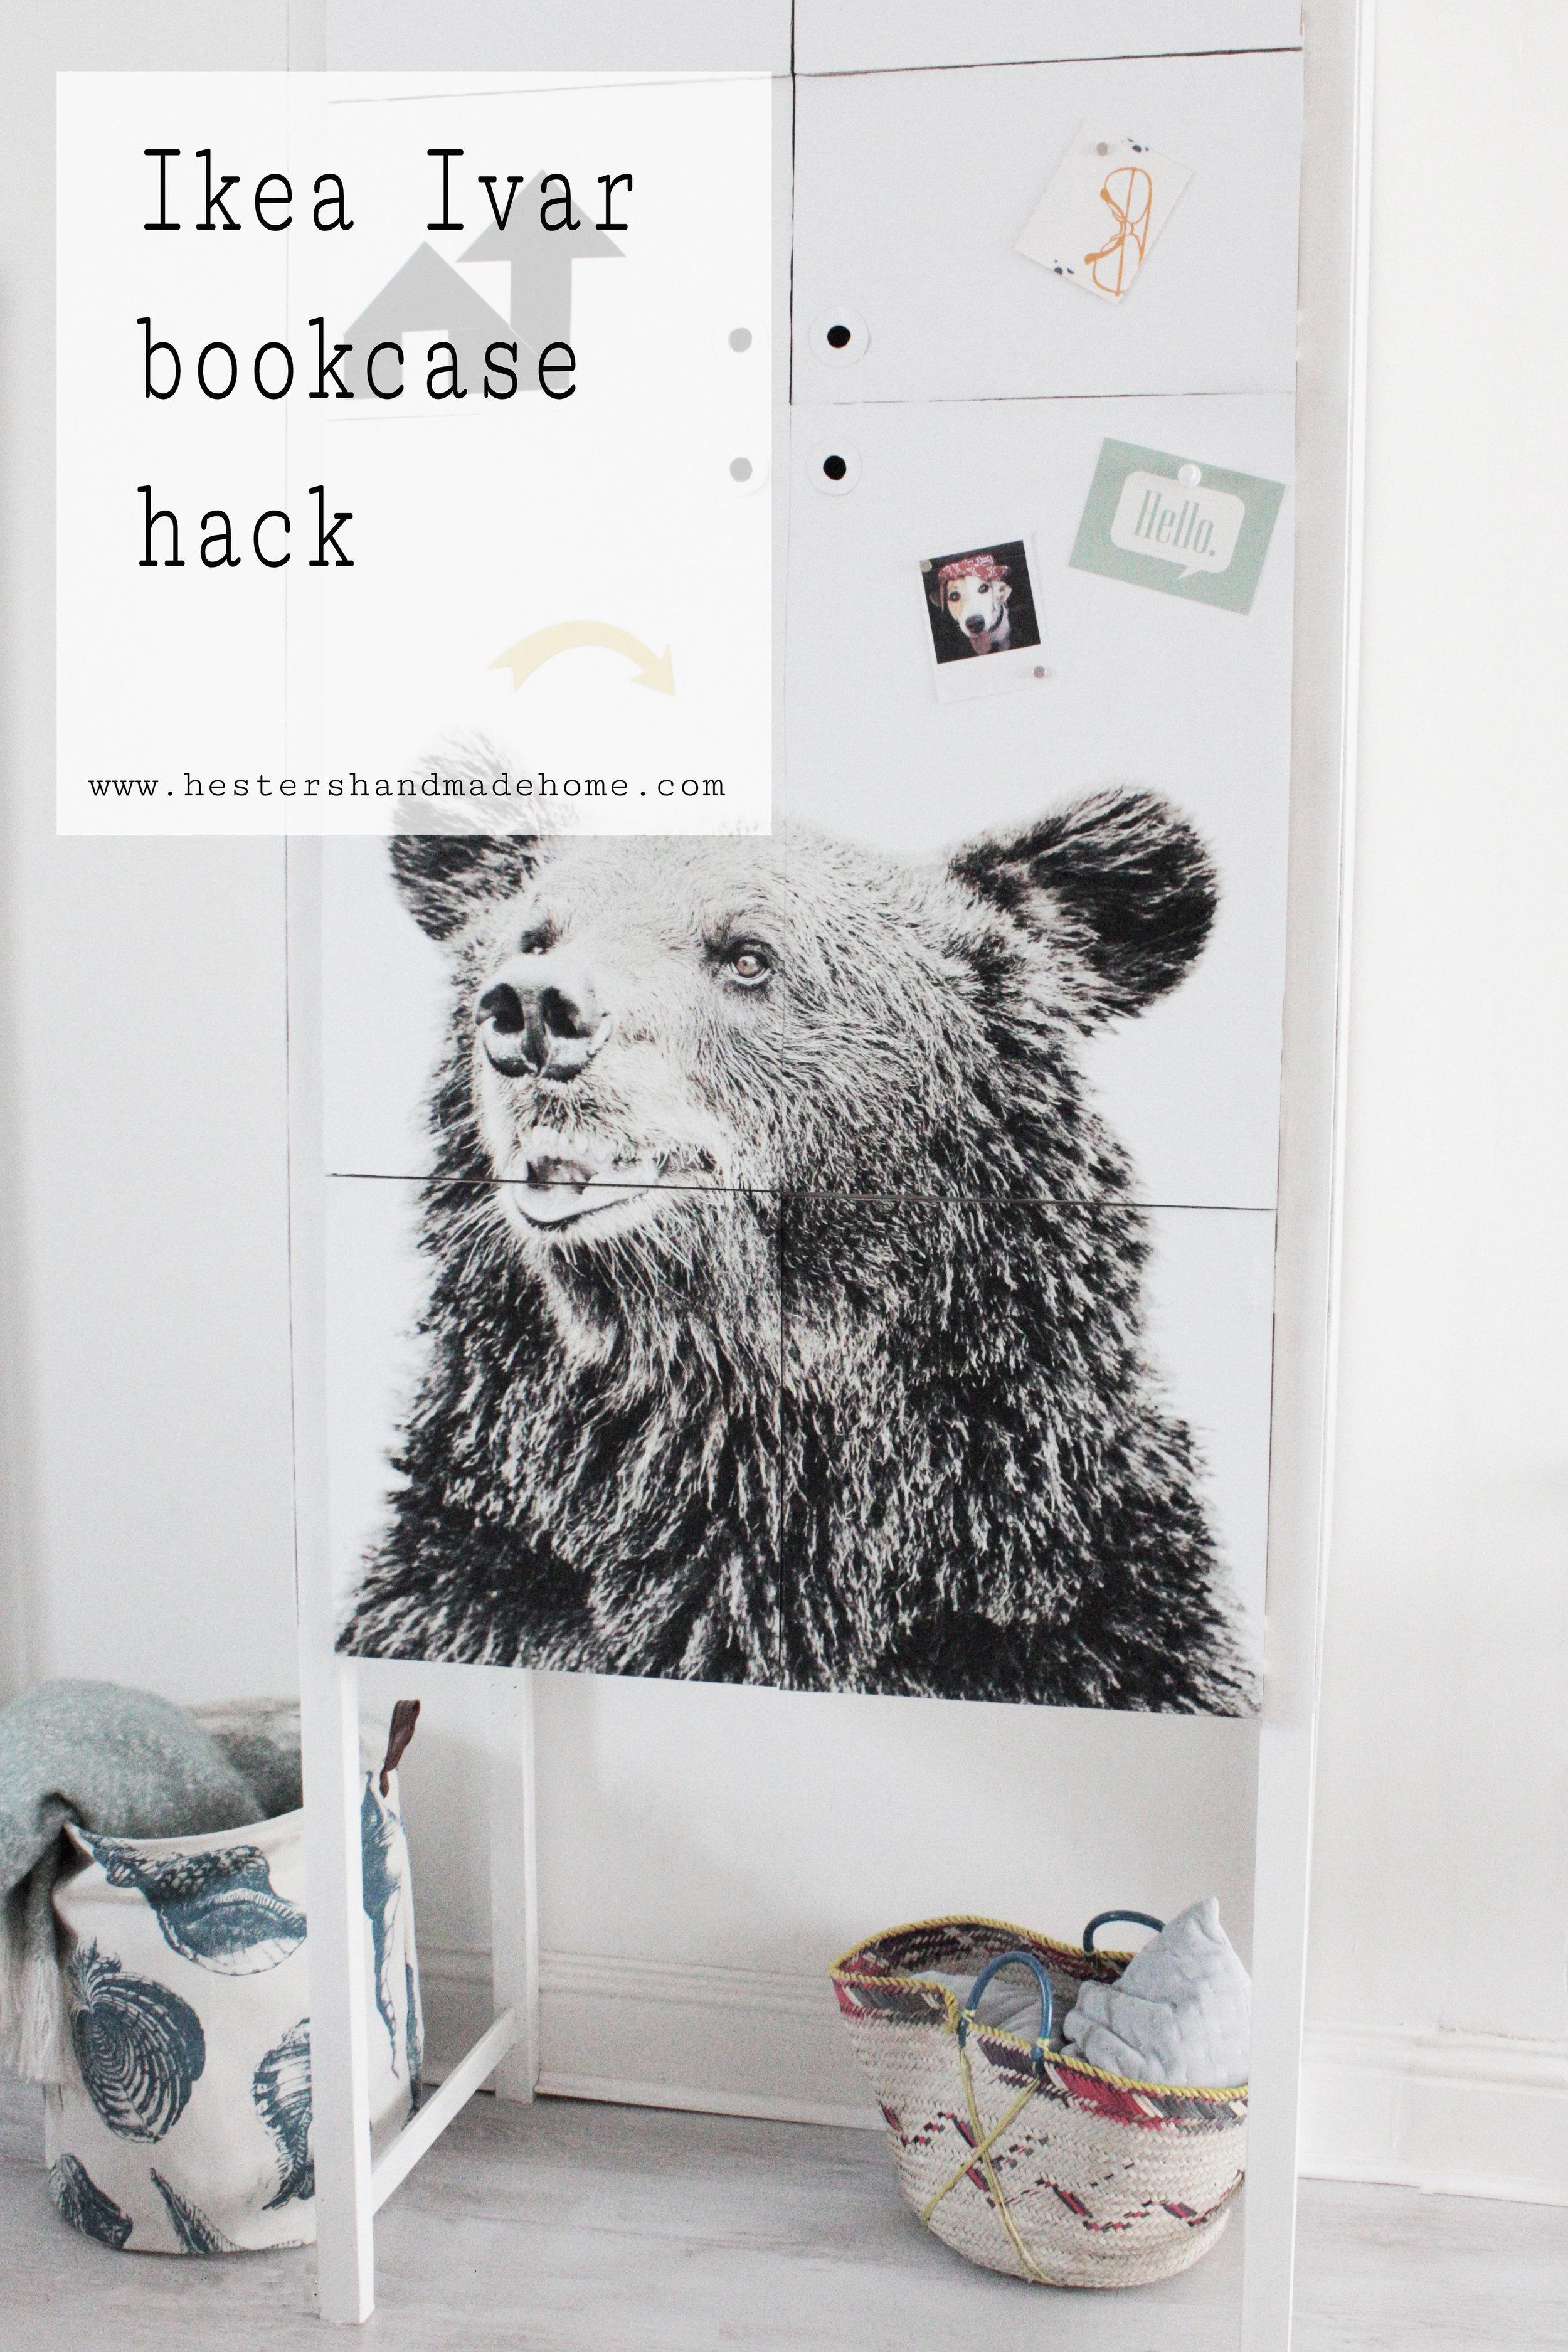 Ikea Ivar bookcase hack tutorial by Hester's handmade Home